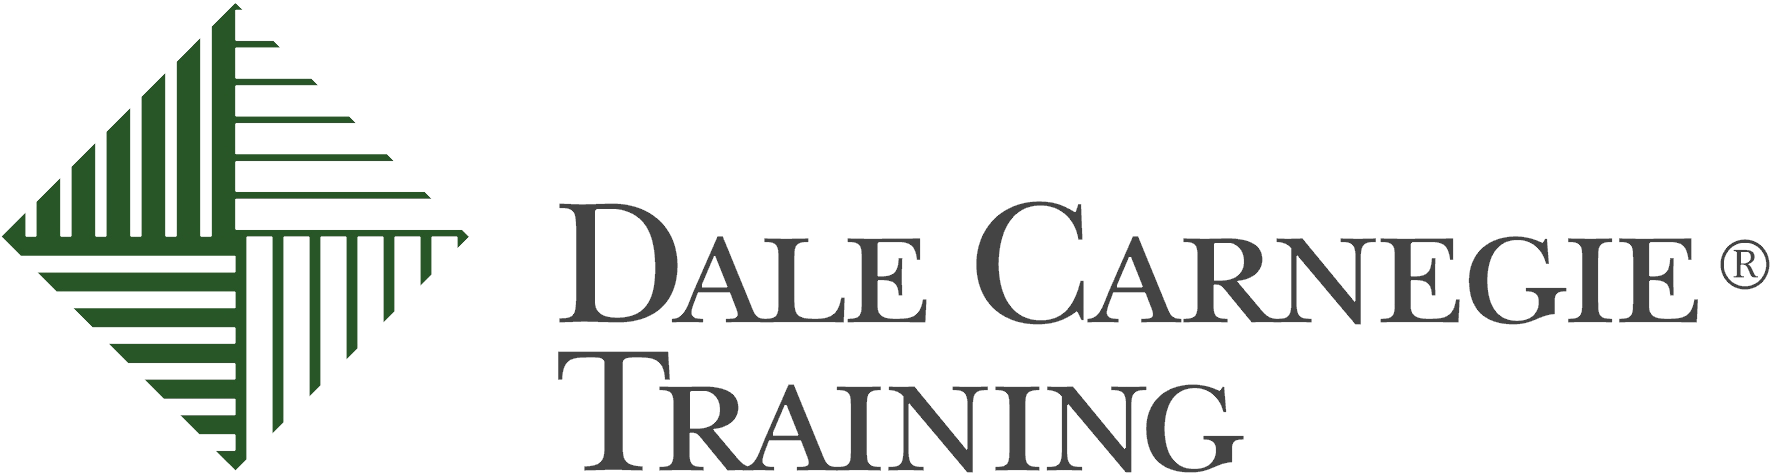 Dale carnegie course_3day_apr14 (2)